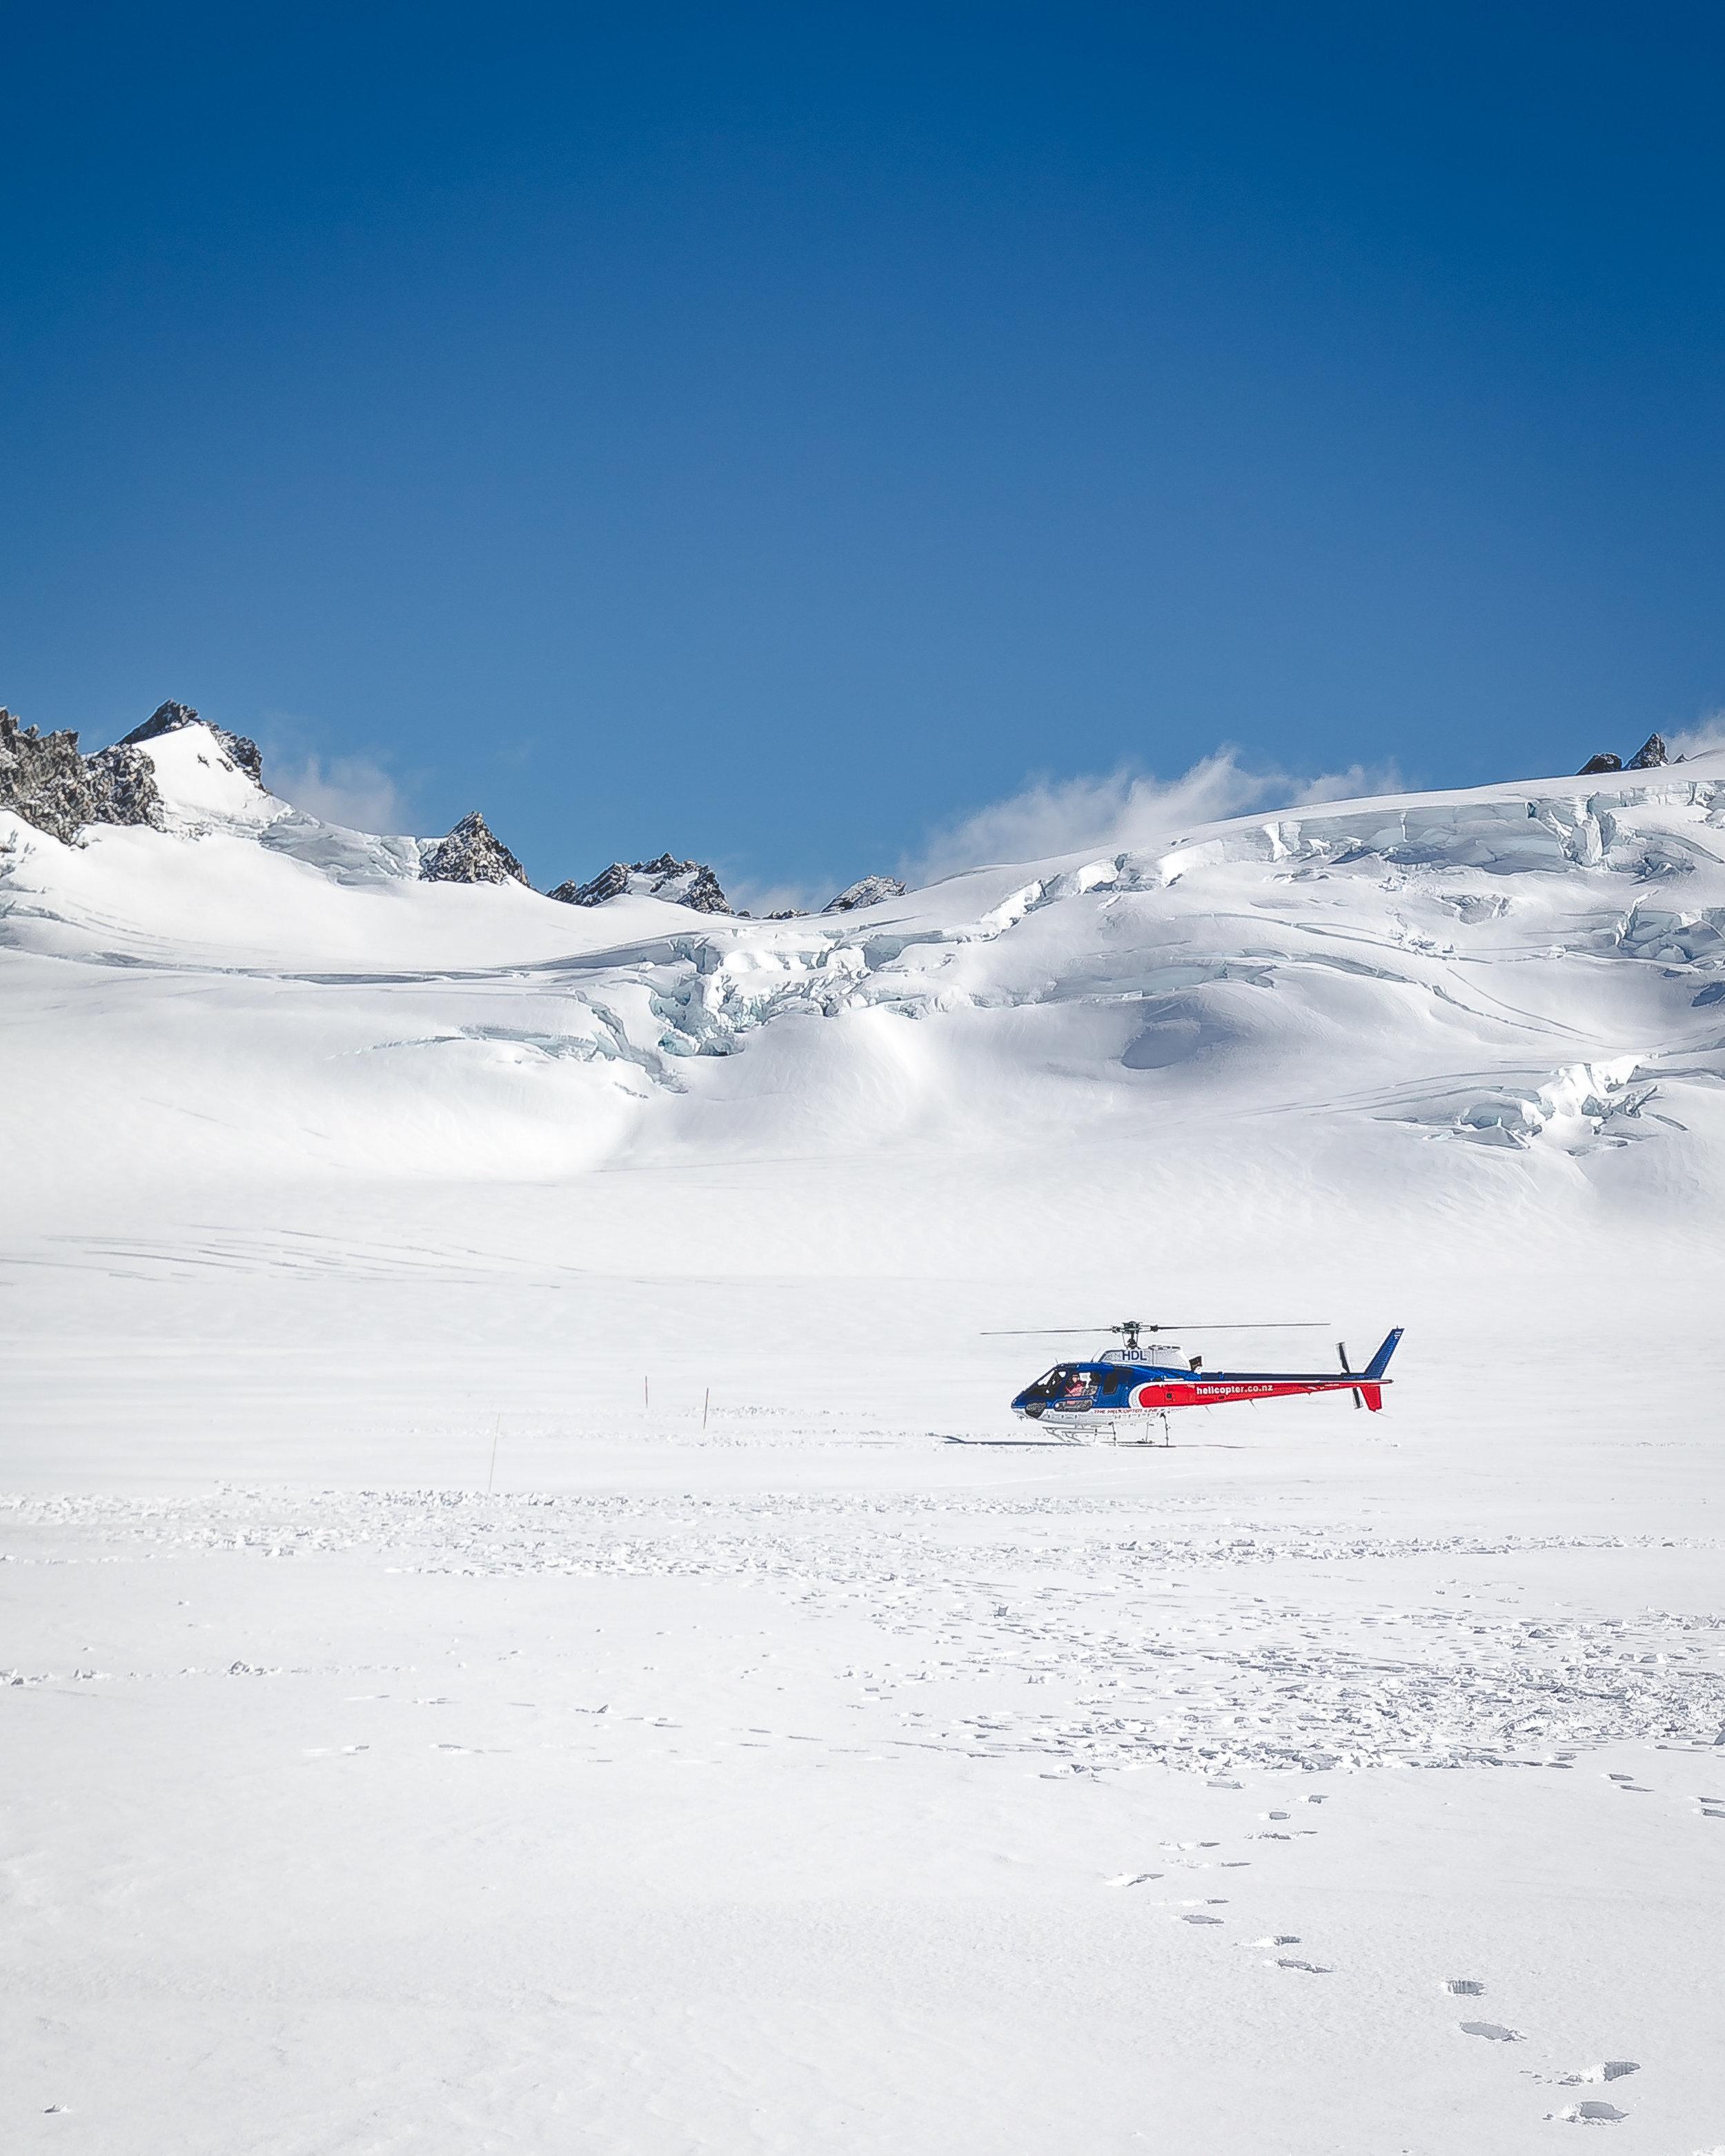 2 week New Zealand South Island Itinerary: Franz Josef Glacier